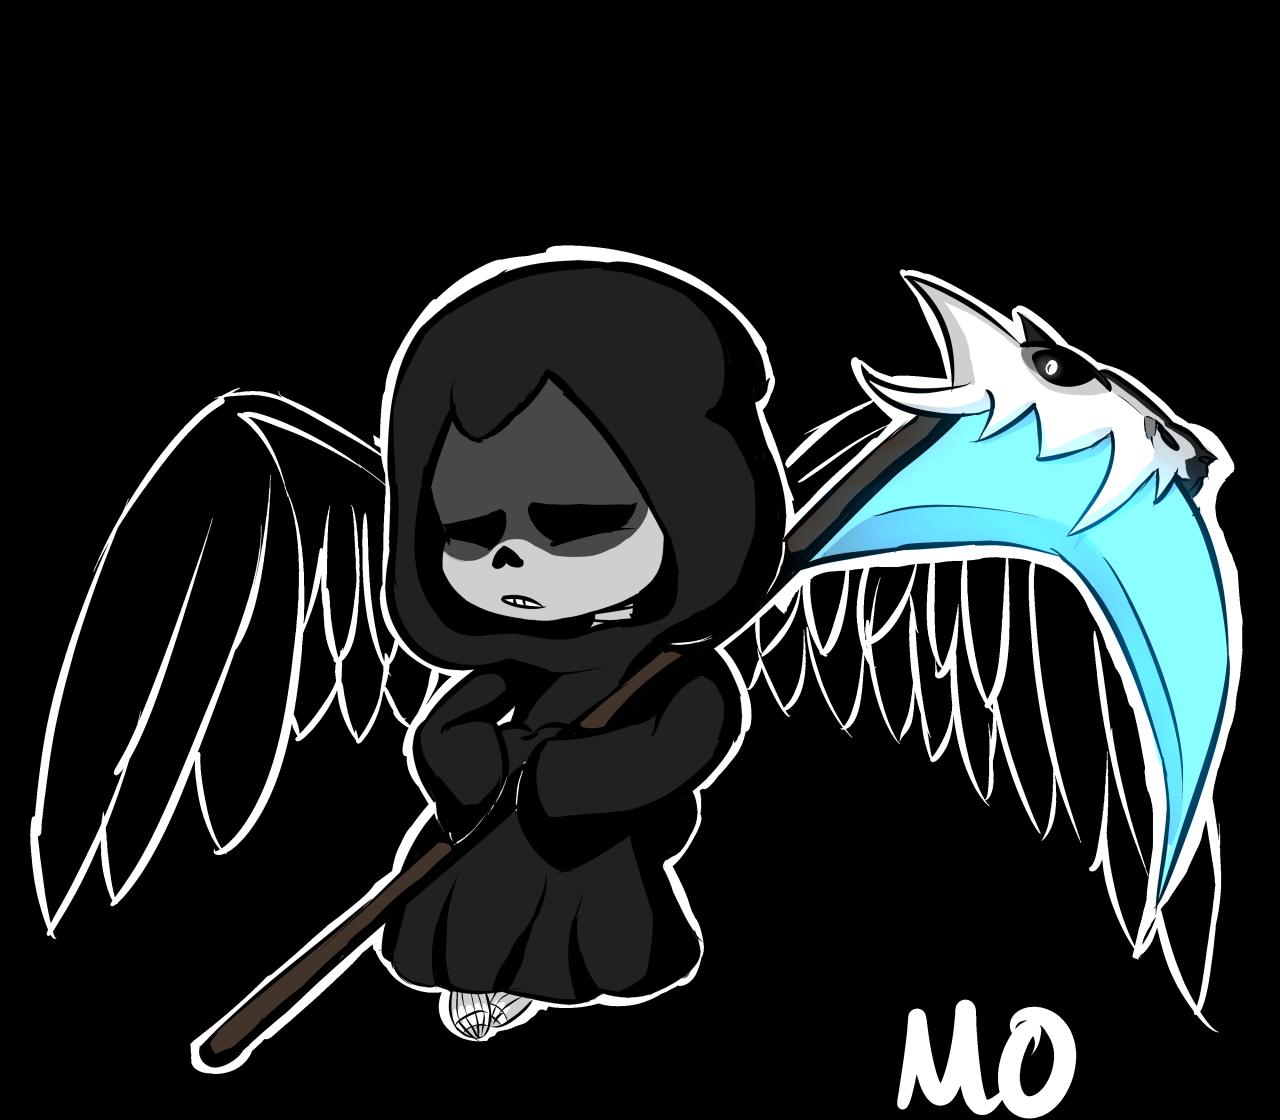 Toolazytodoitnow Anime Vs Cartoon Undertale Drawings Grim Reaper Cartoon